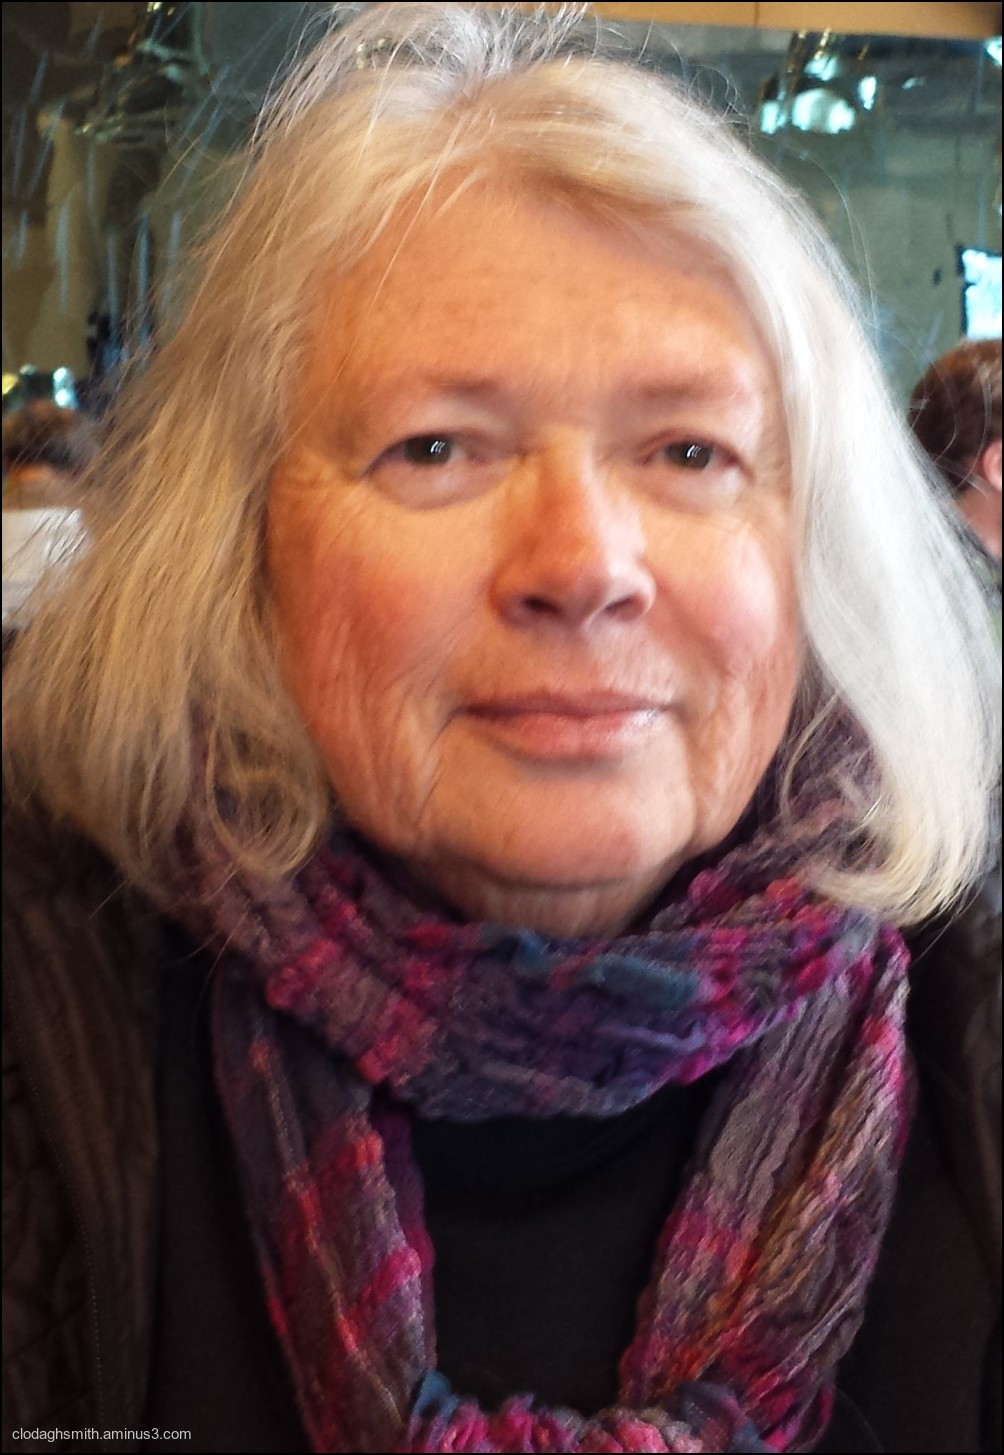 https://www.eastlawn.com/obituary/claudia-smith/